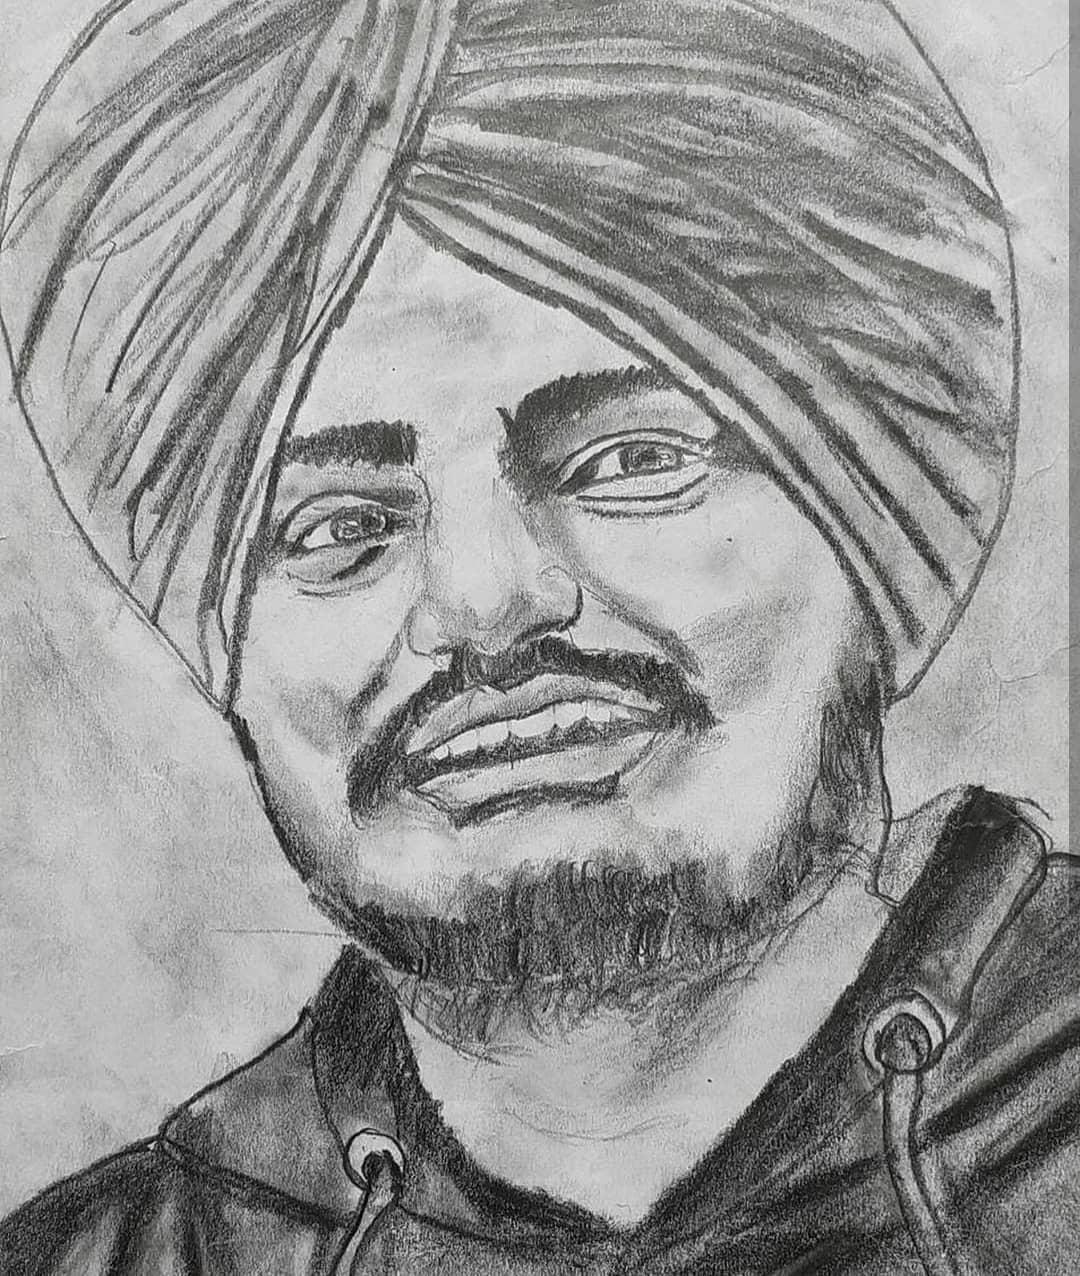 Sidhu Moose Wala Sketch Photo